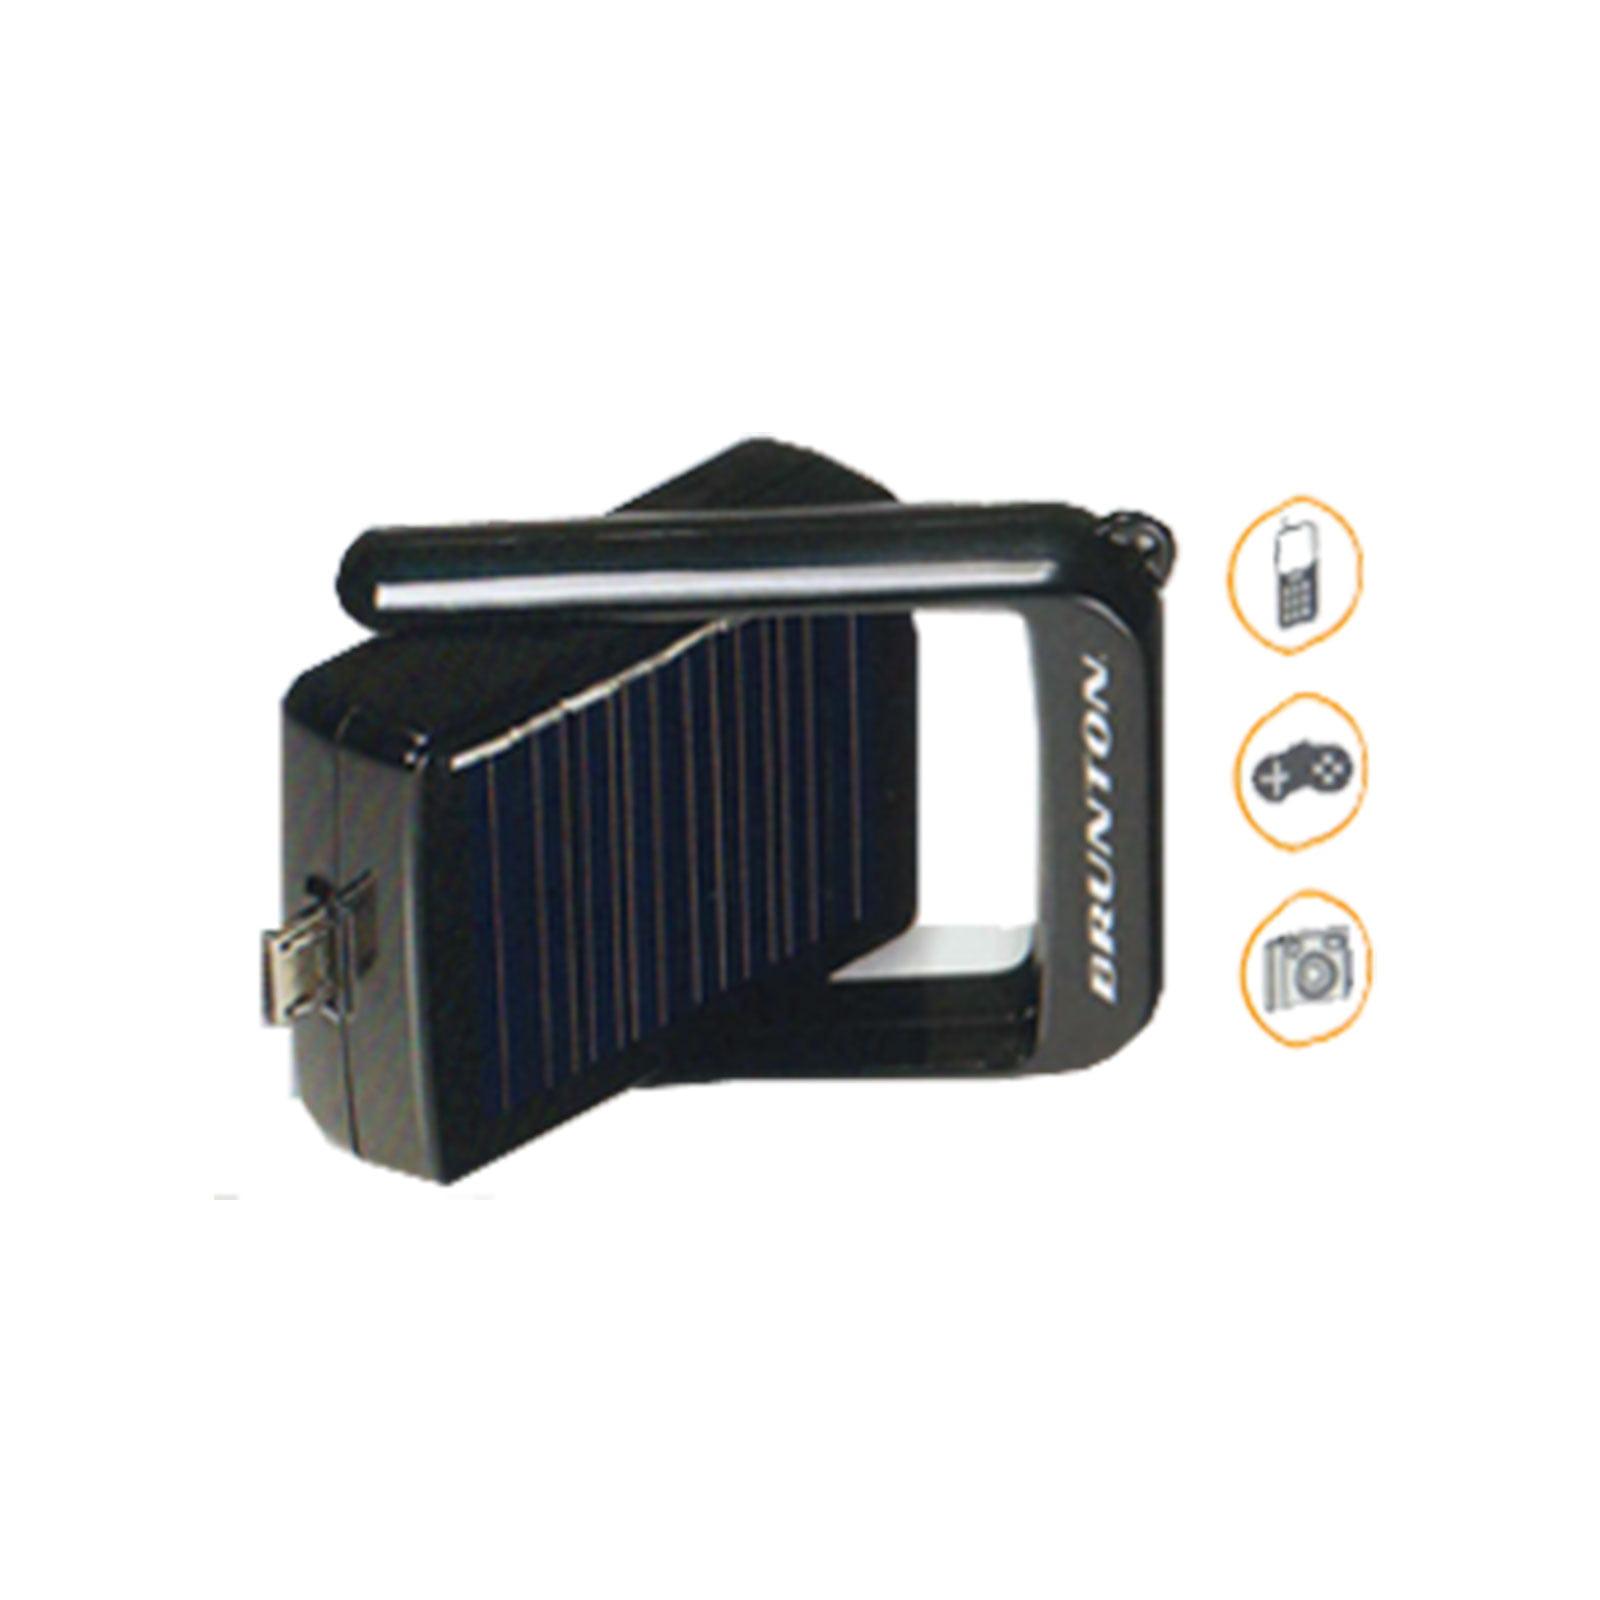 Brunton Outdoor FBUMP-USB Bump Power Pack 550mah Rechargeable Battery W  Solar by BRUNTON OUTDOOR INC